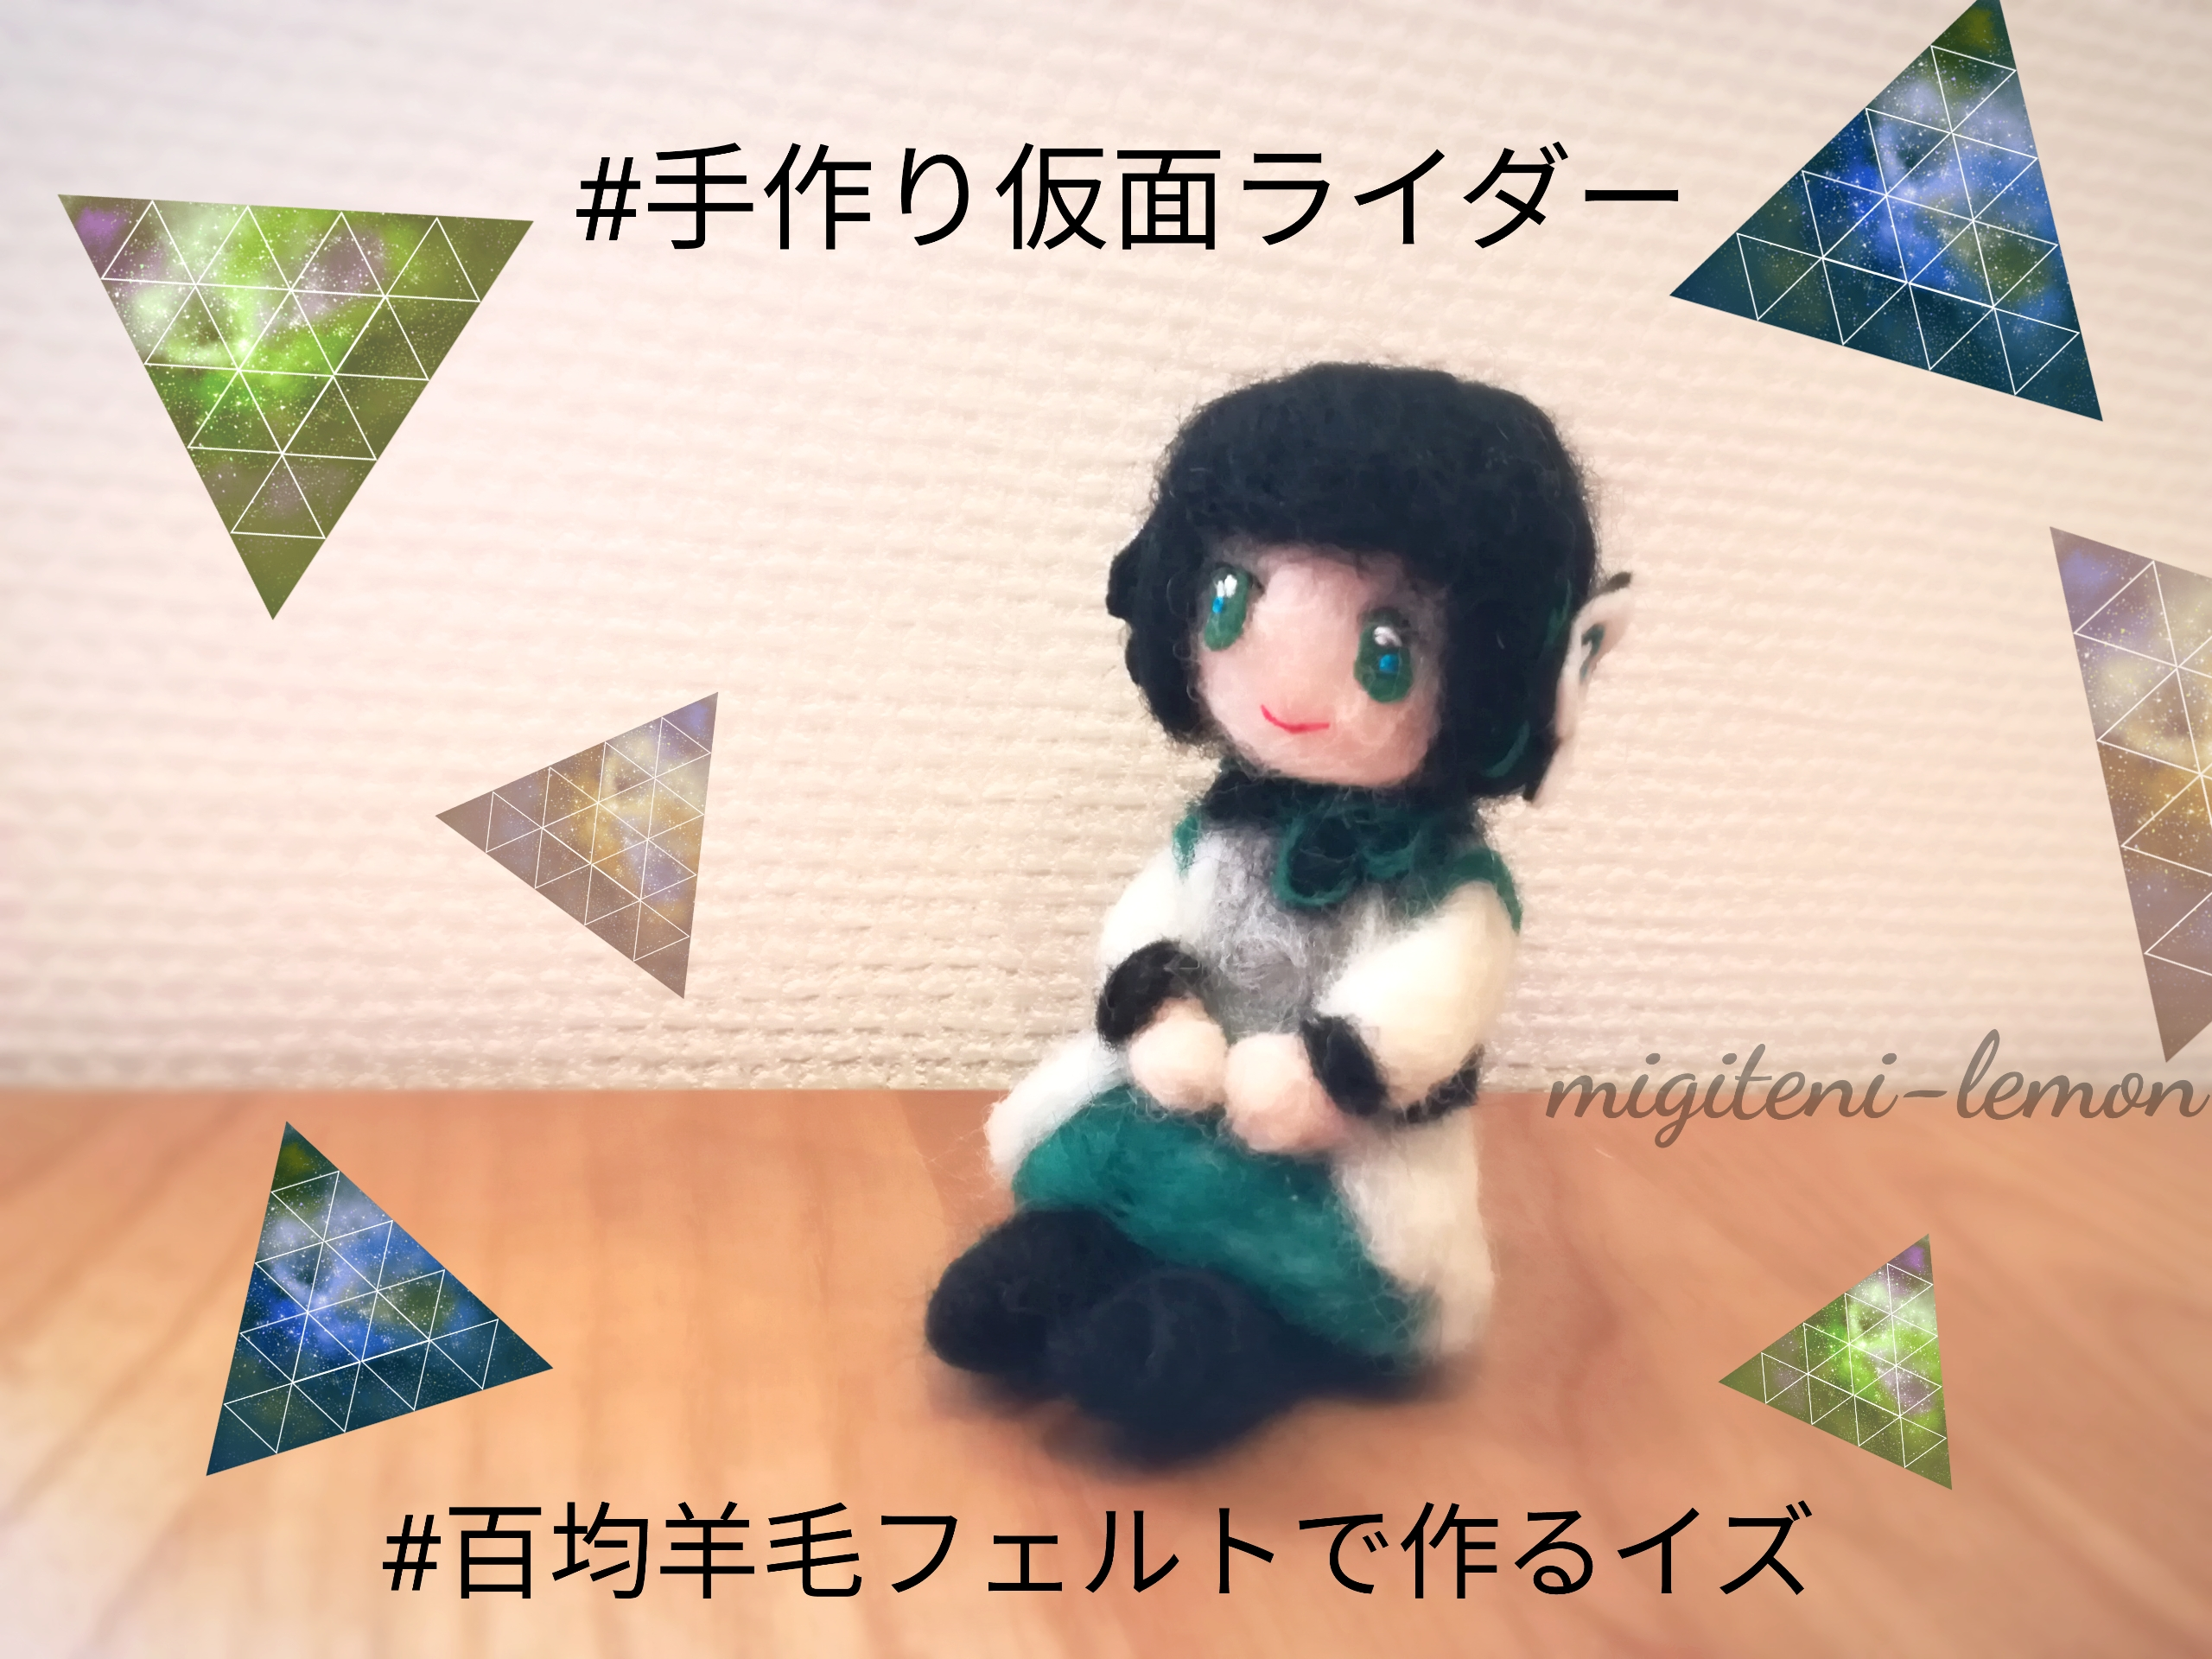 kamenrider01-izu-ai-felt